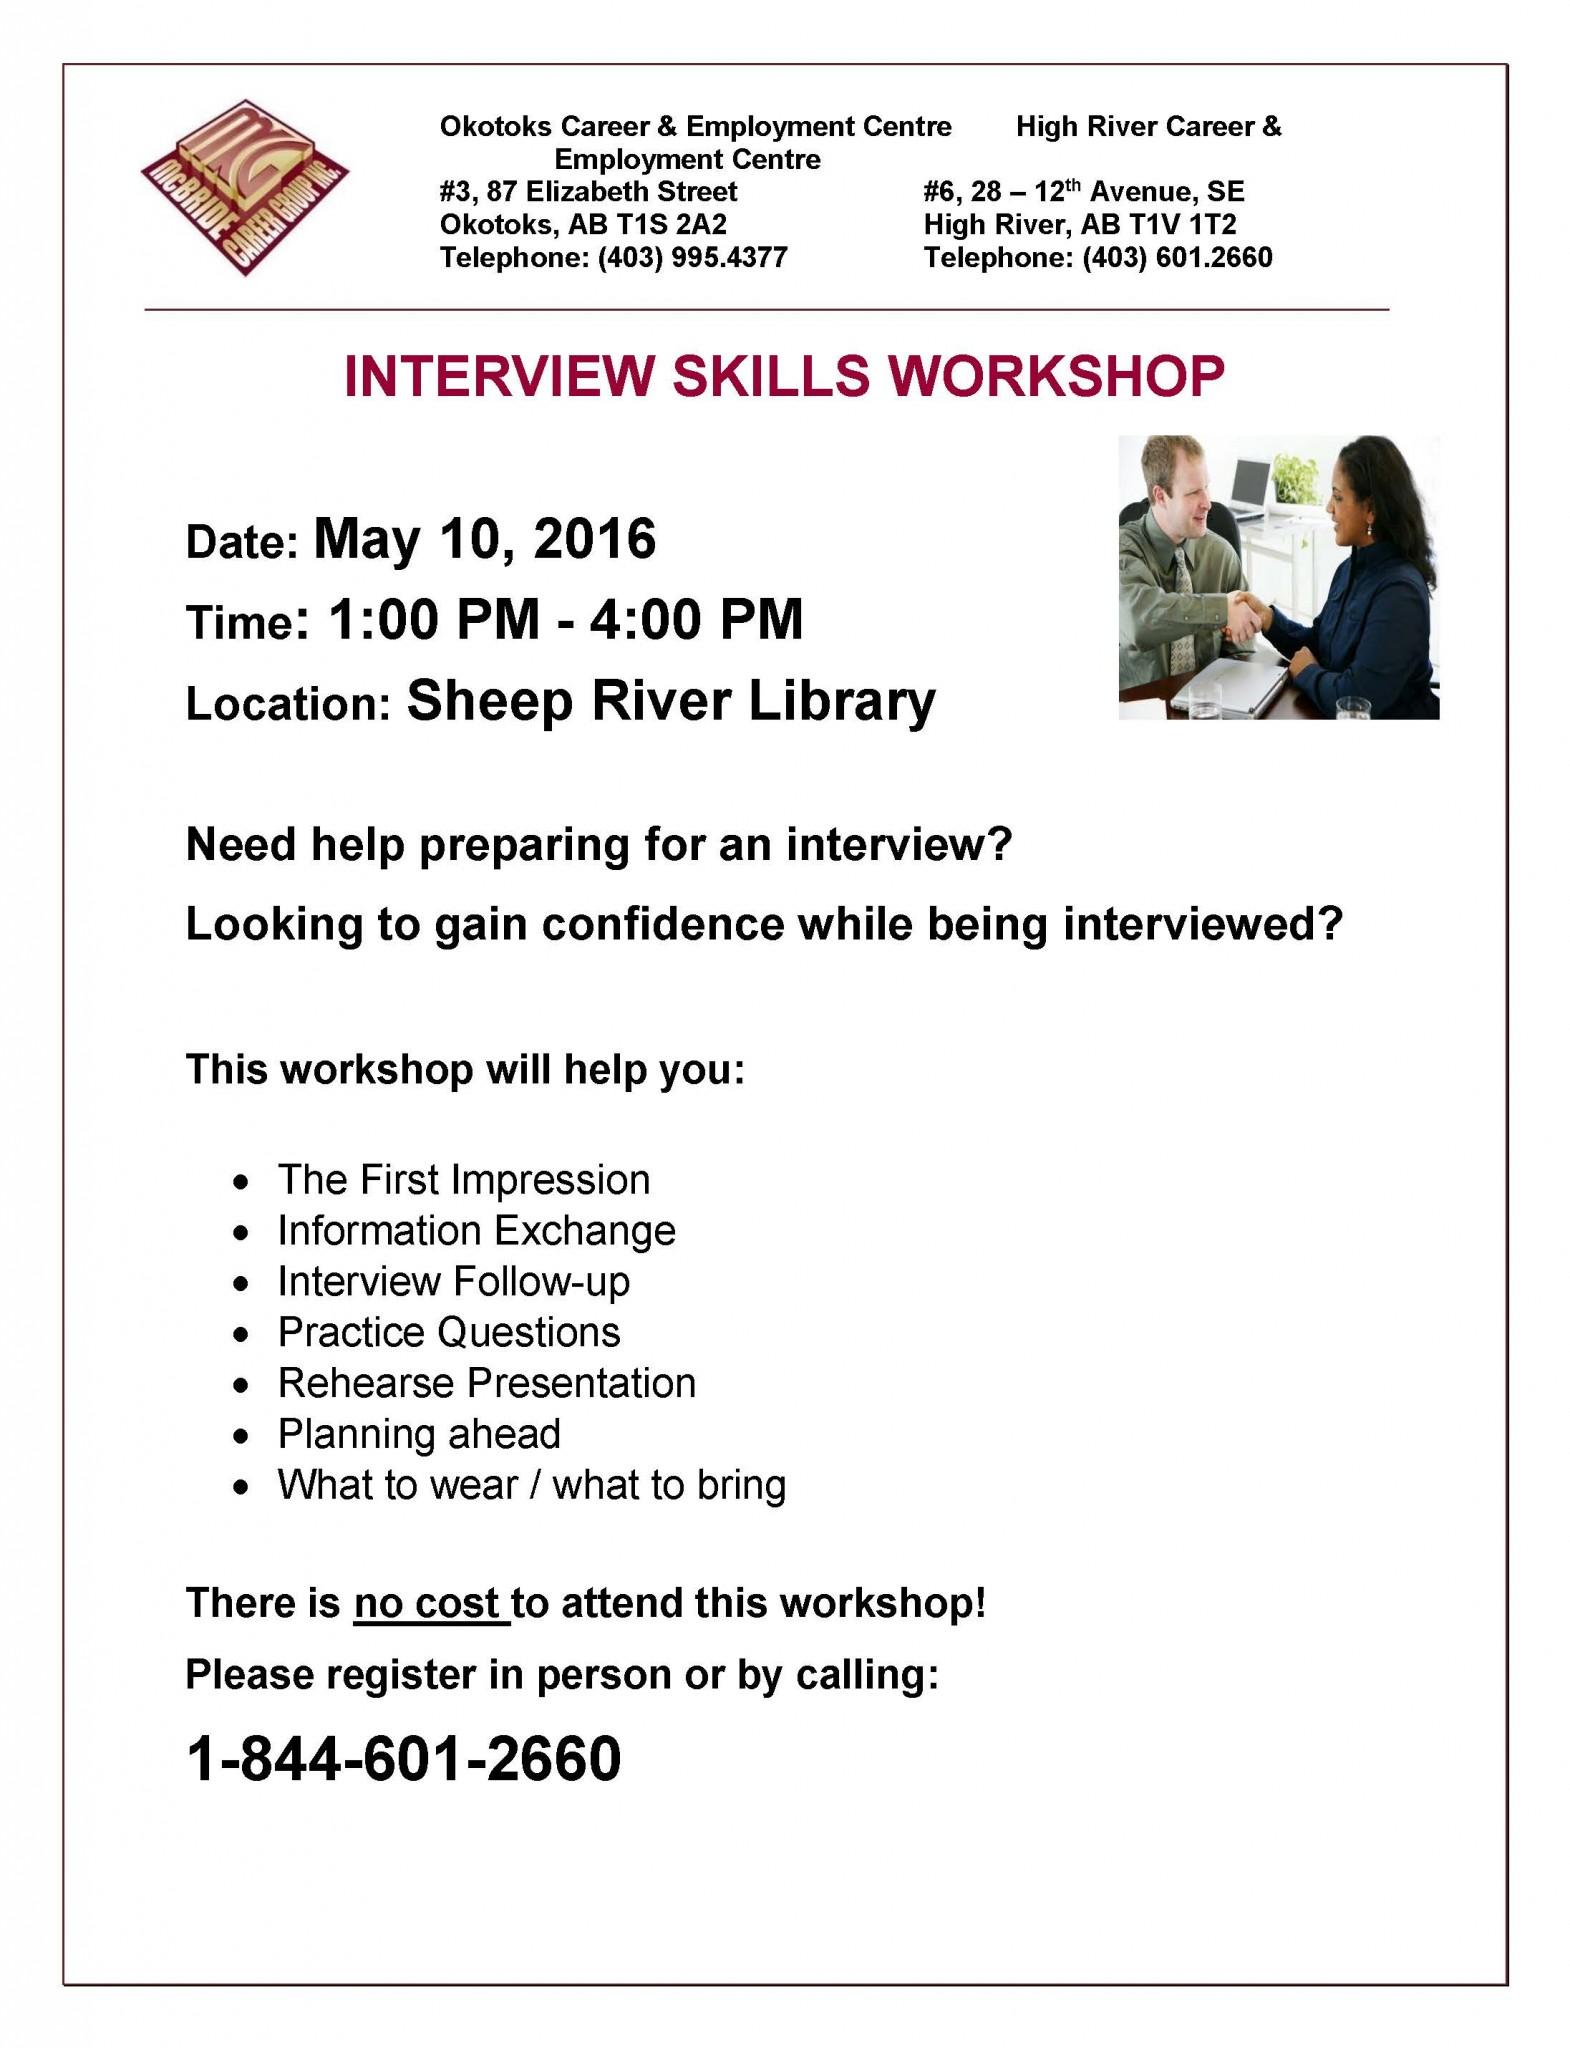 interview skills workshop poster turner valley interview skills workshop poster 10 2016